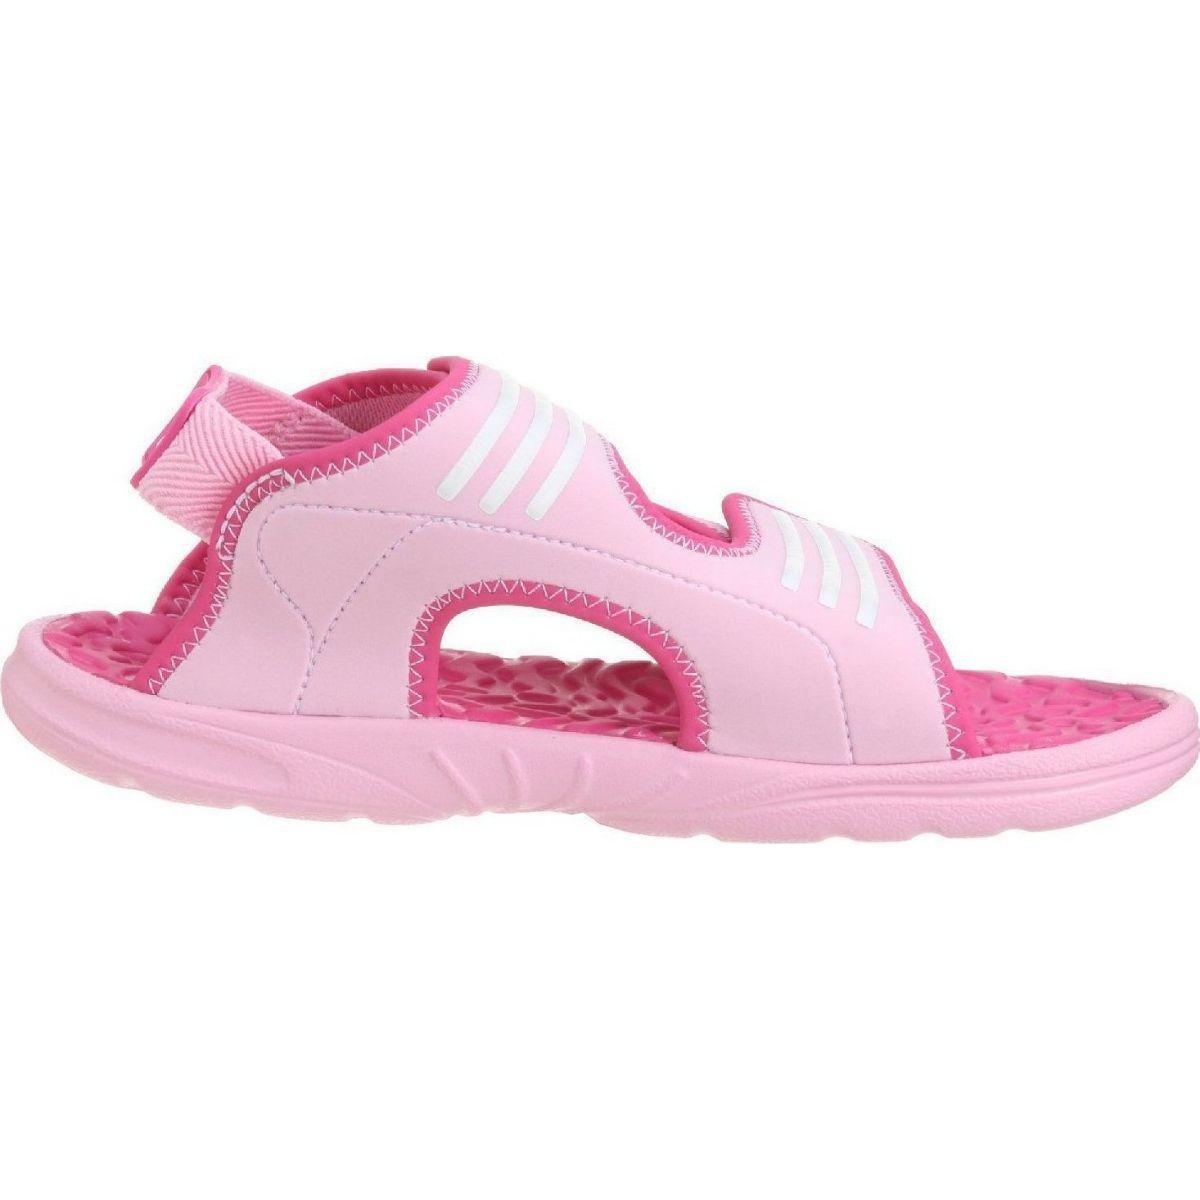 Sandalo Adidas Akwah 5 Rosa...